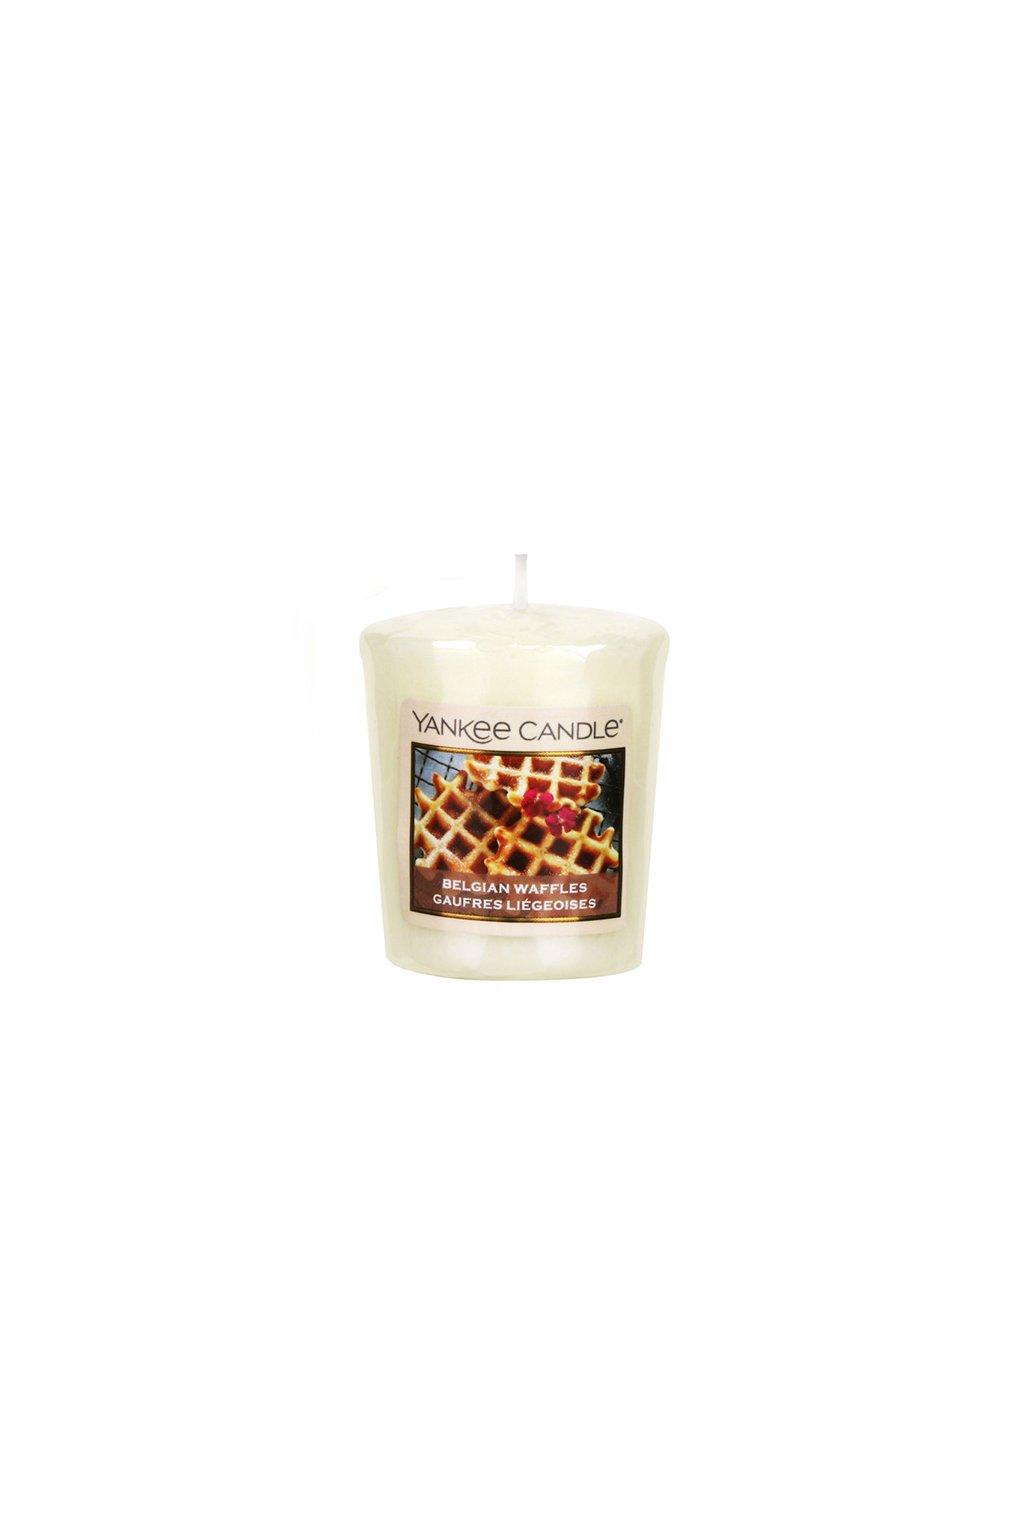 Yankee Candle Belgian Waffles 49g